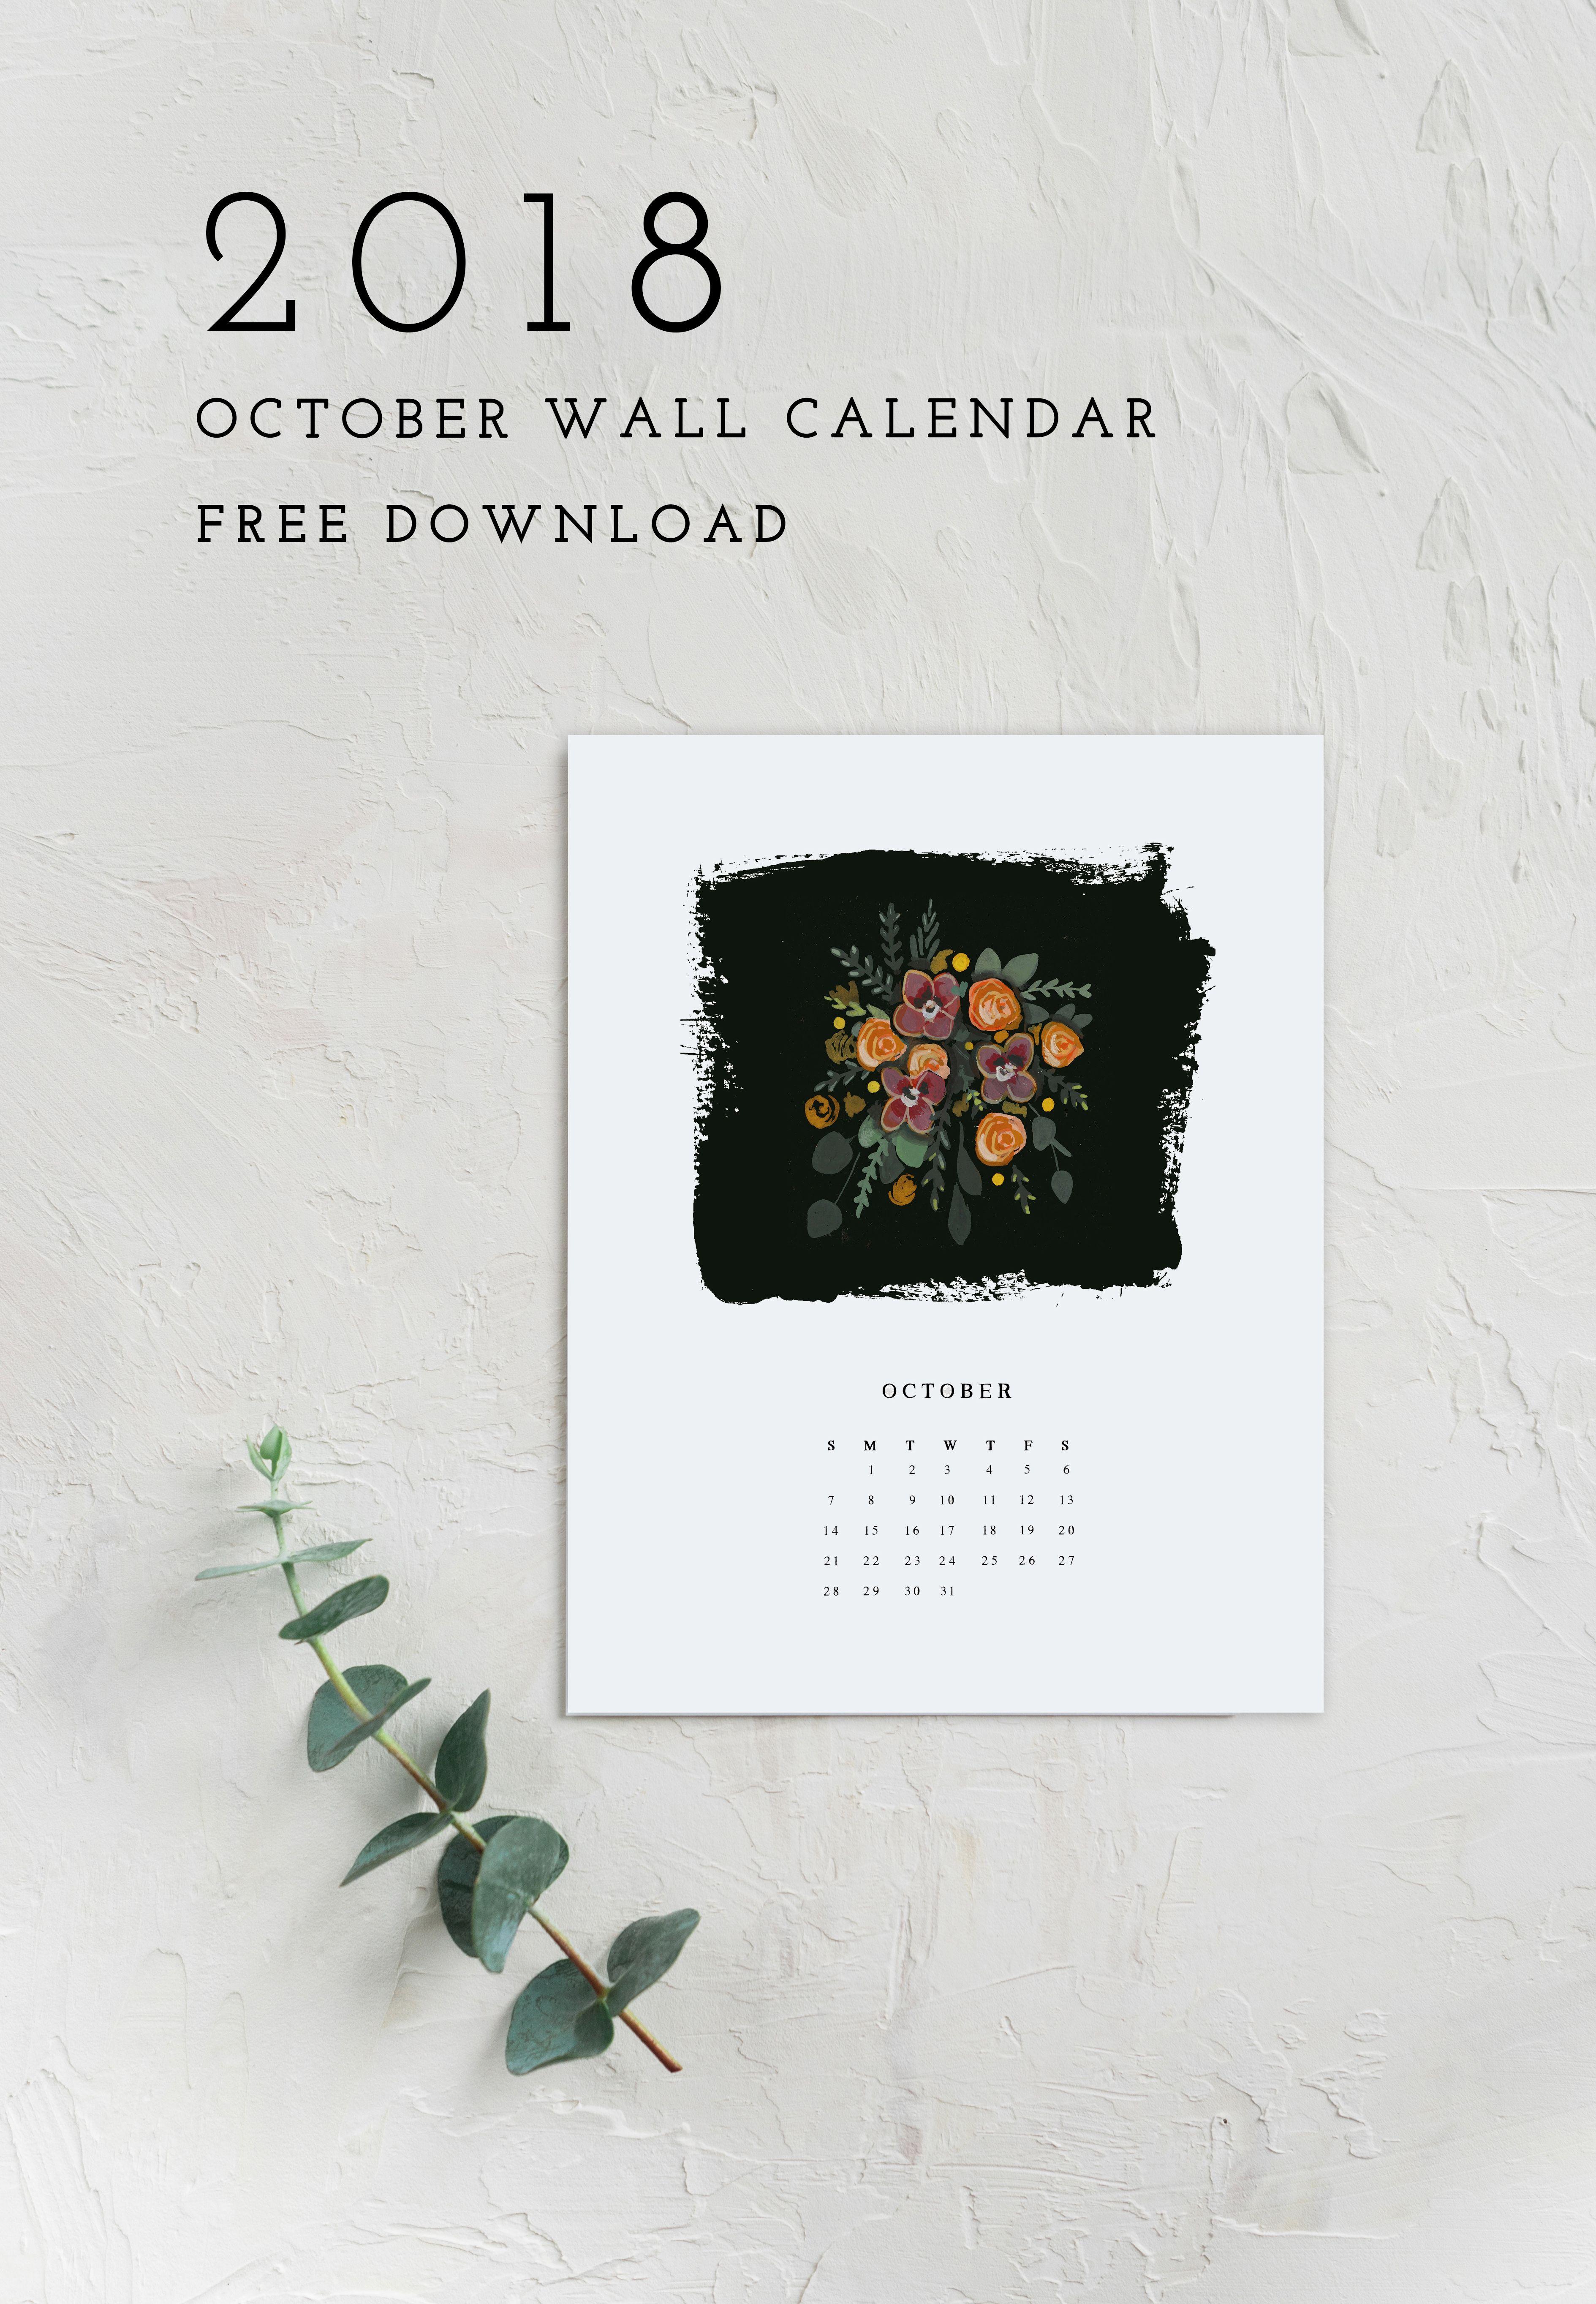 2018 October Calendar Printable Download calendar